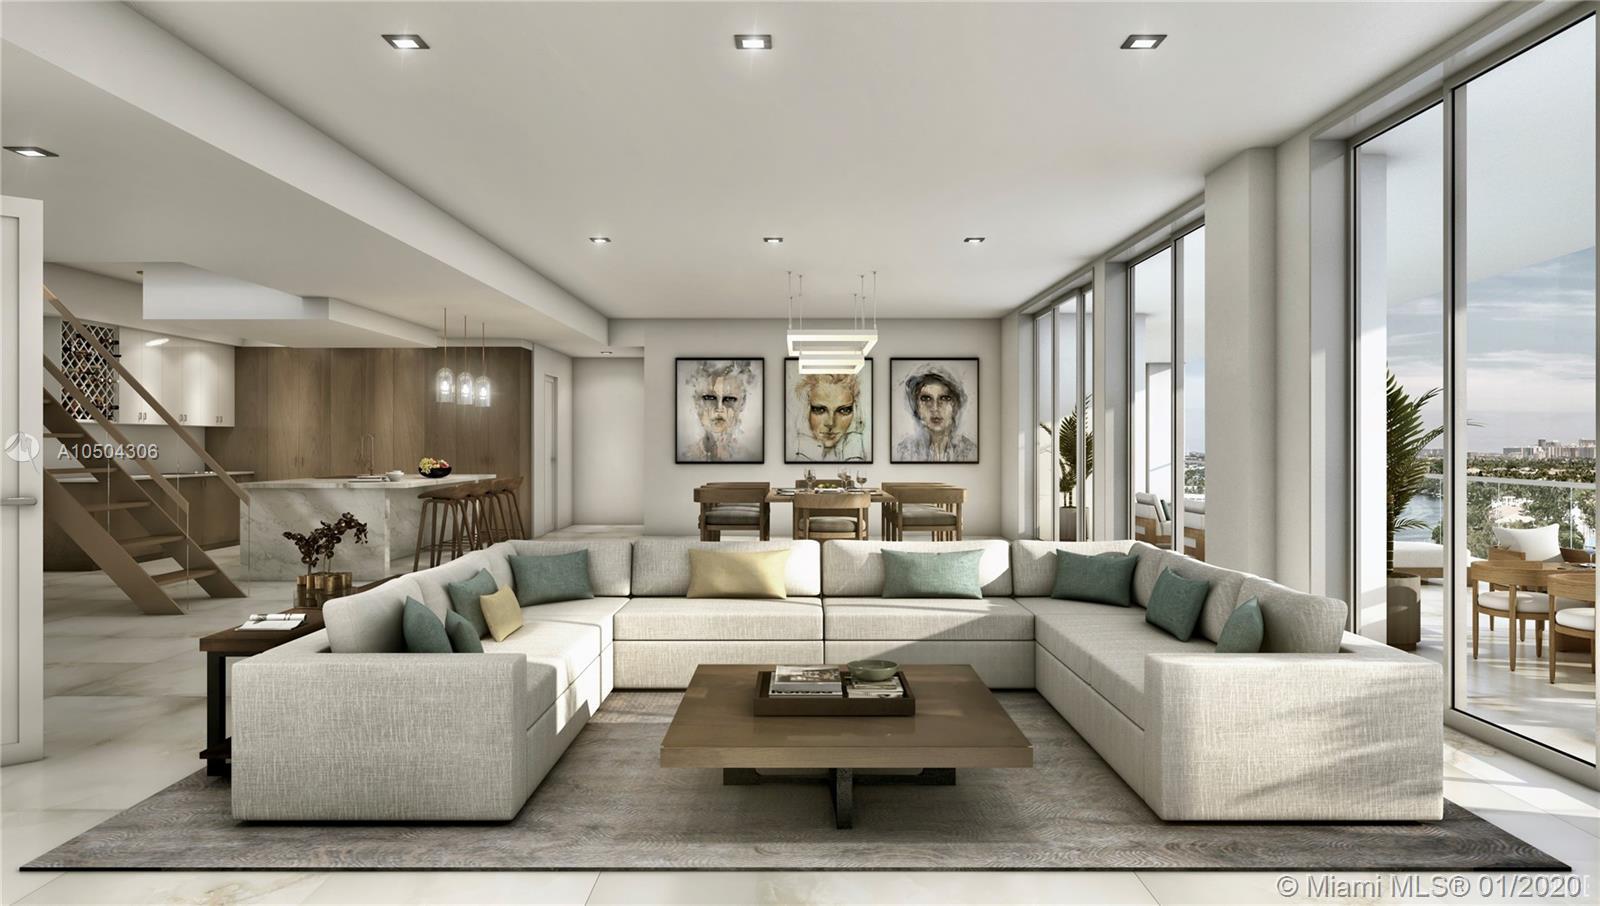 1180 N Federal Hwy #PH1508, Fort Lauderdale, FL 33304 - Fort Lauderdale, FL real estate listing